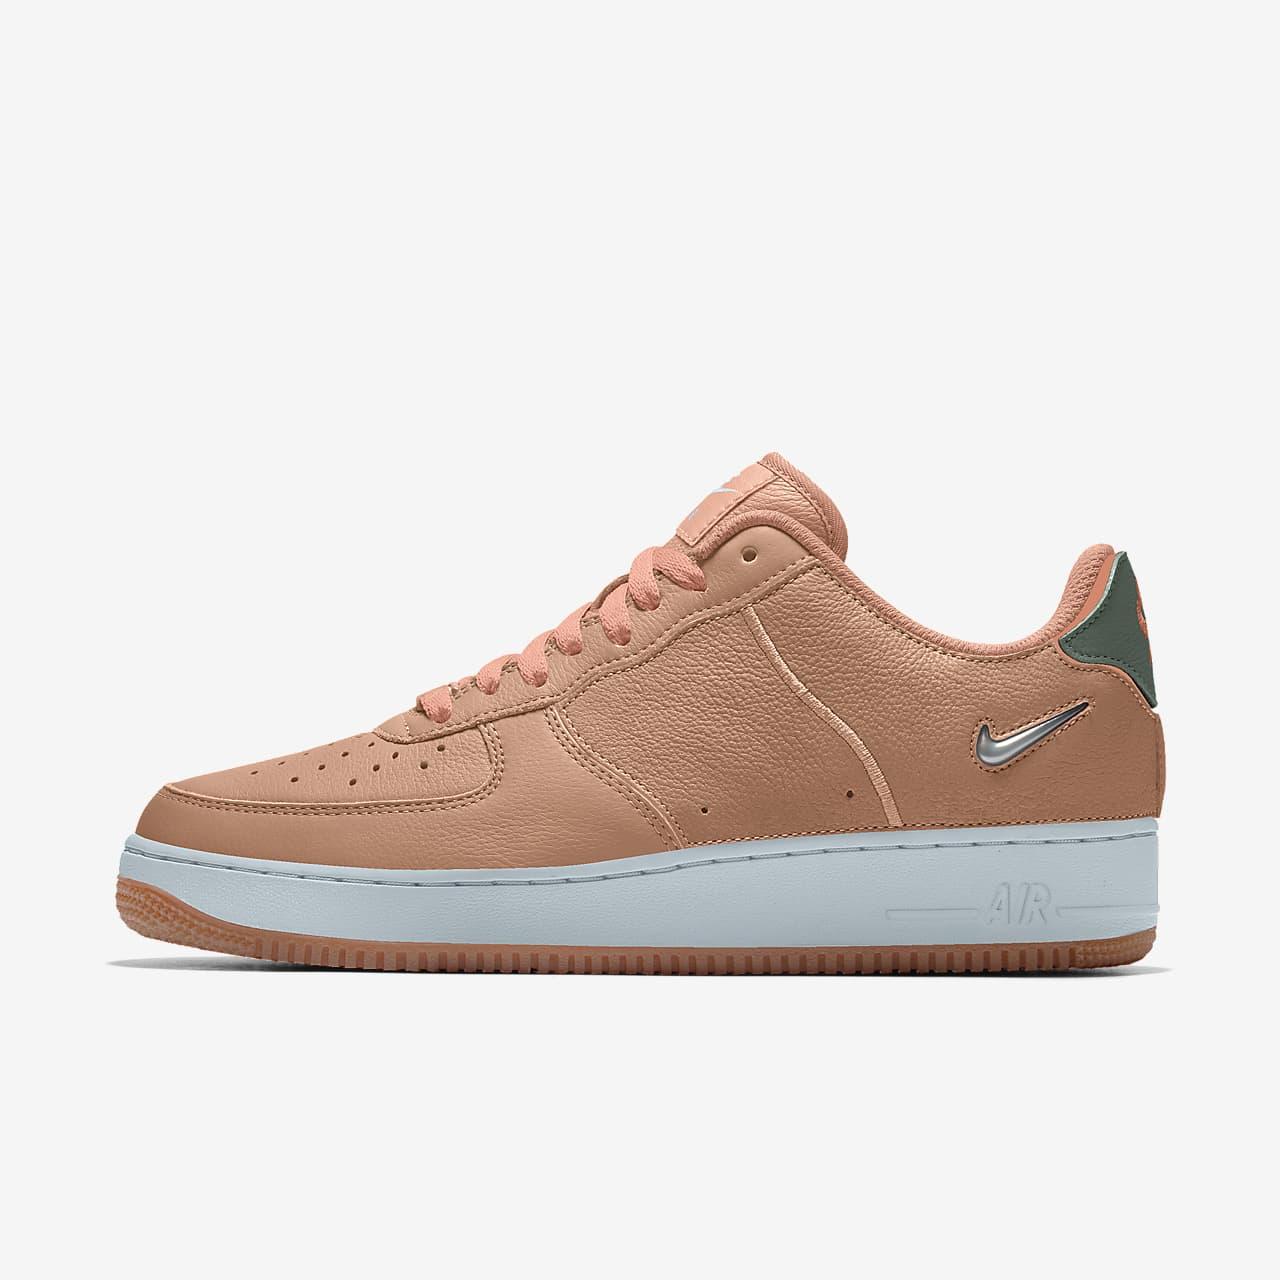 Nike Air Force 1/1 Unlocked By You Custom Shoe